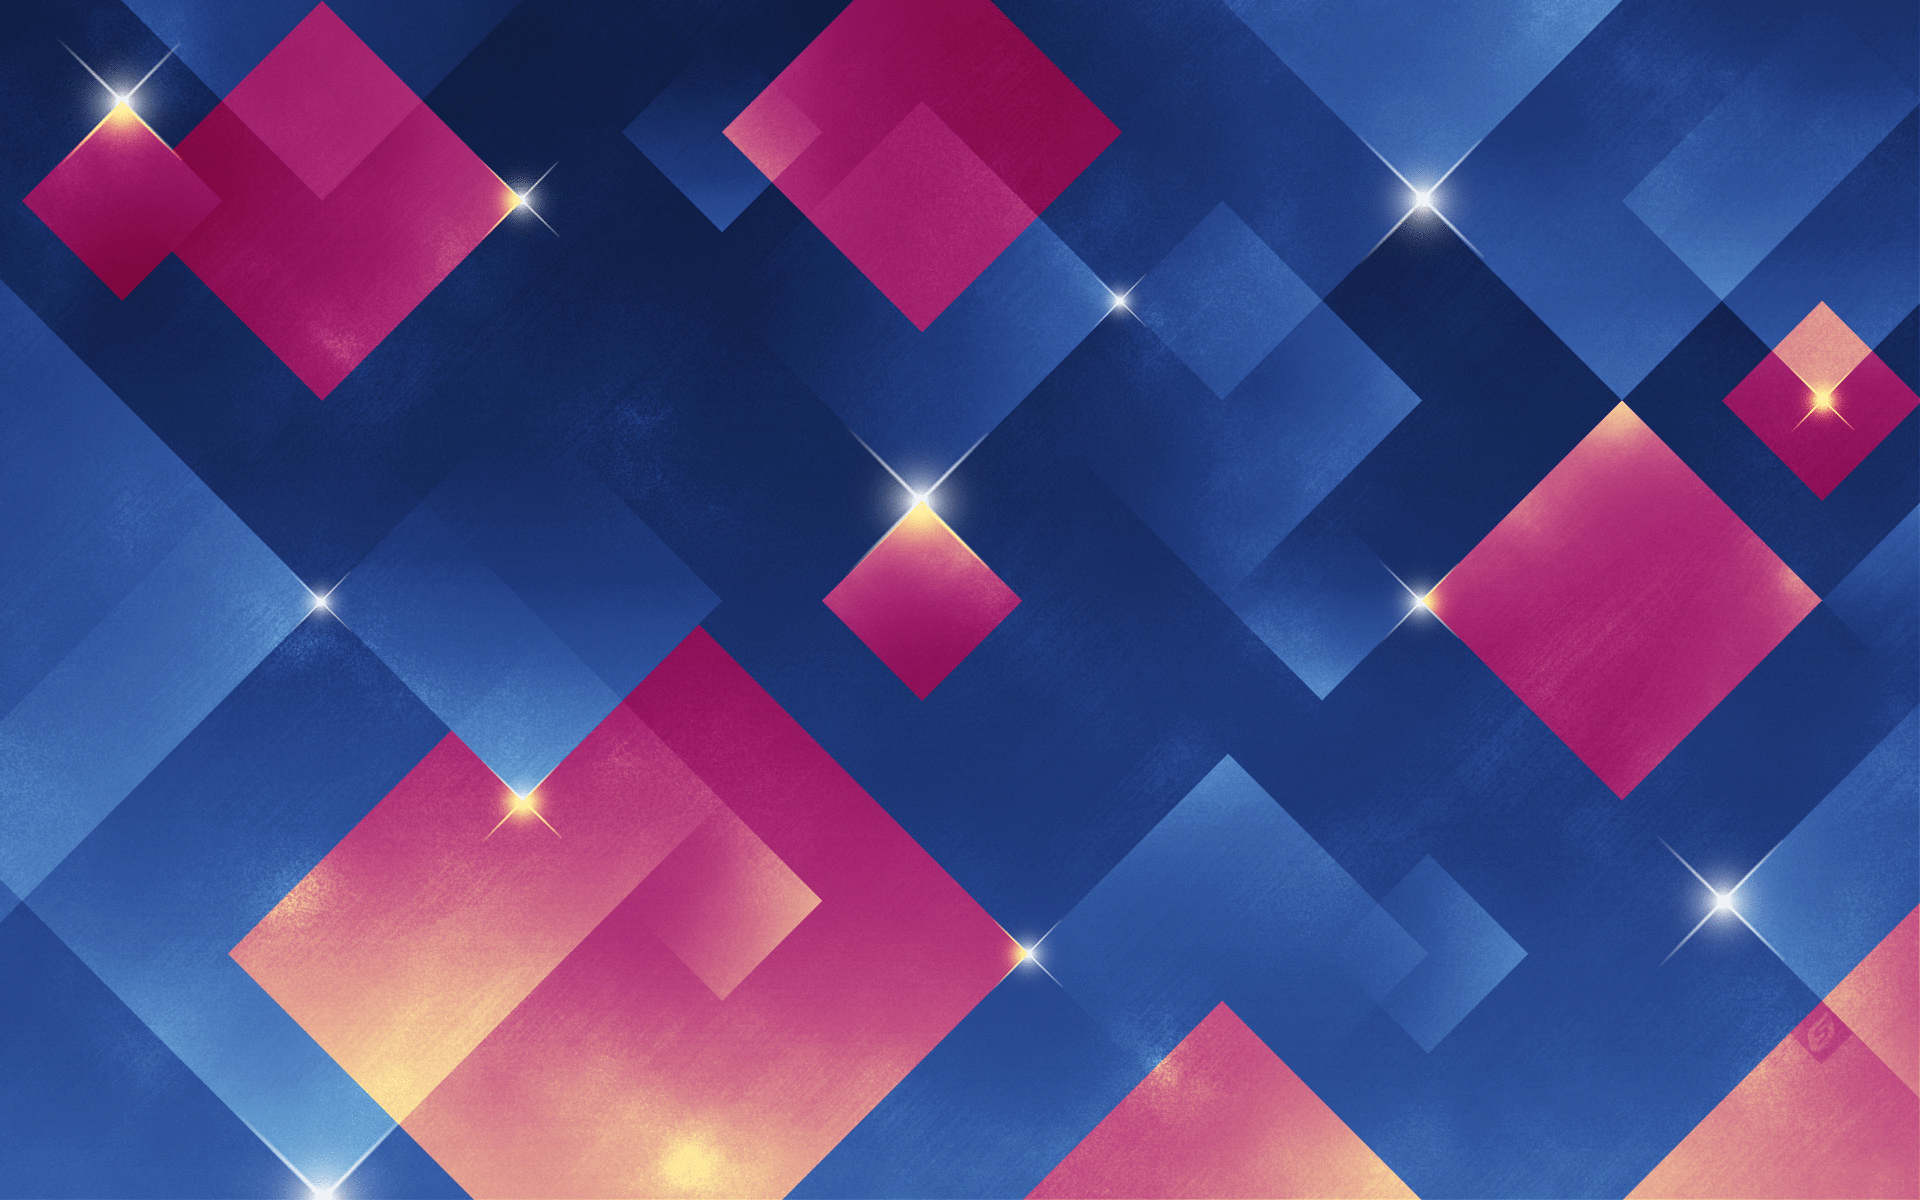 Blue Squares iPad Air Wallpaper Download iPhone Wallpapers